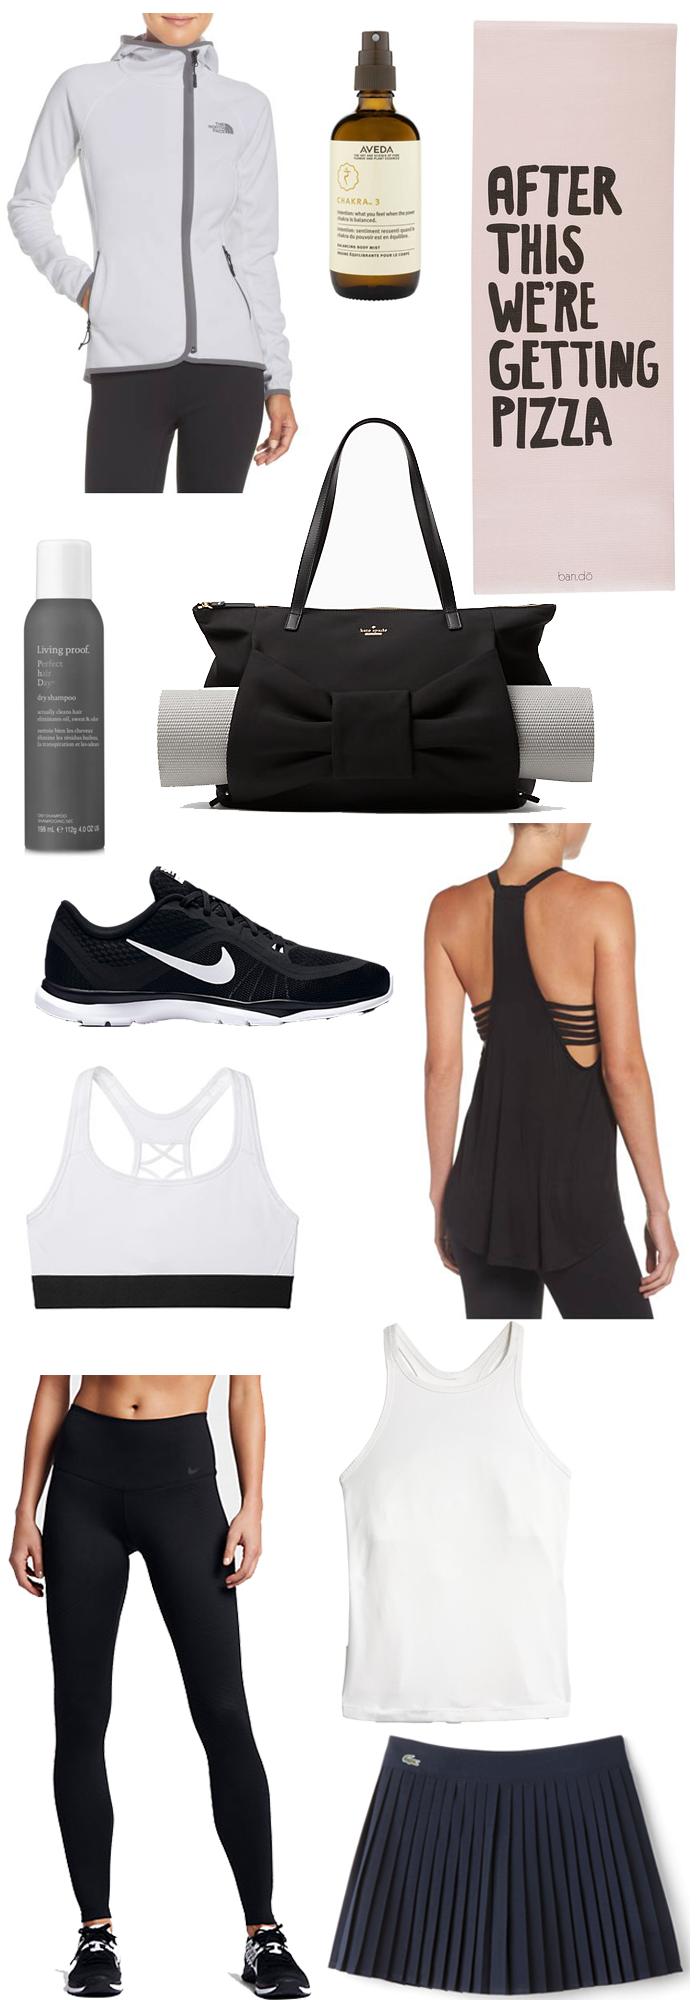 the best workout wear